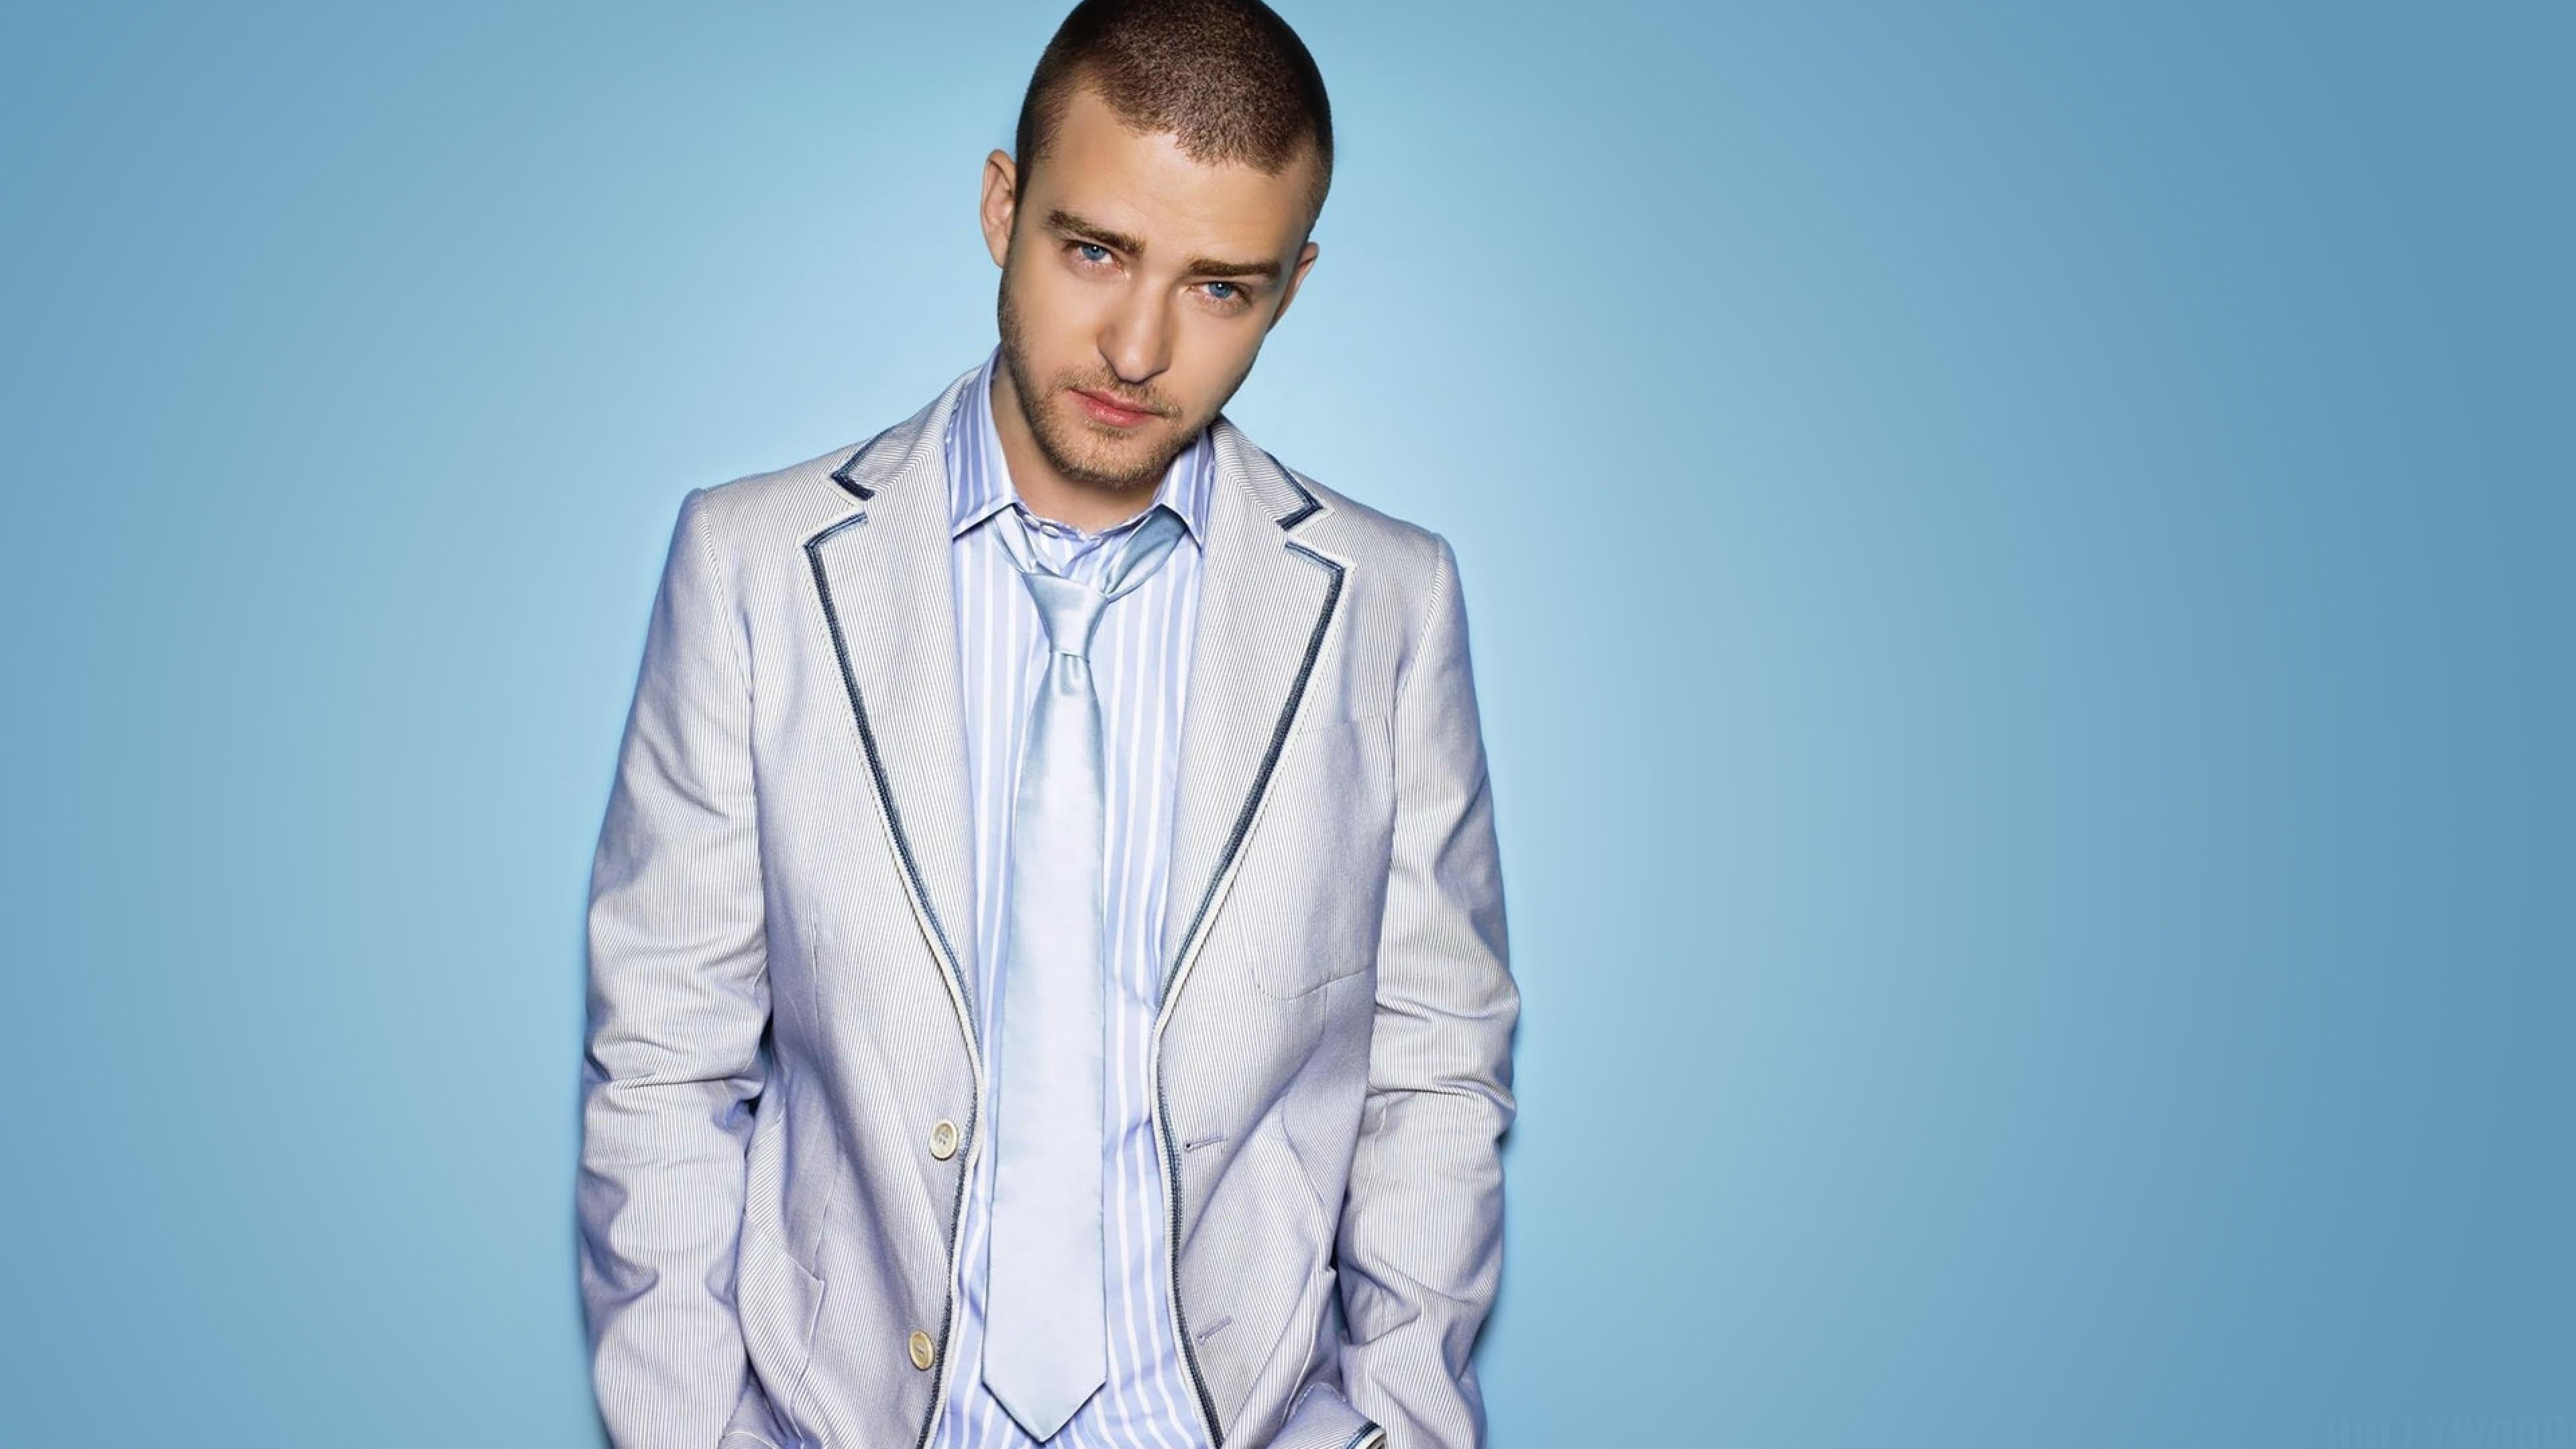 Wallpaper justin timberlake, guy, jacket, bright, cute, charming